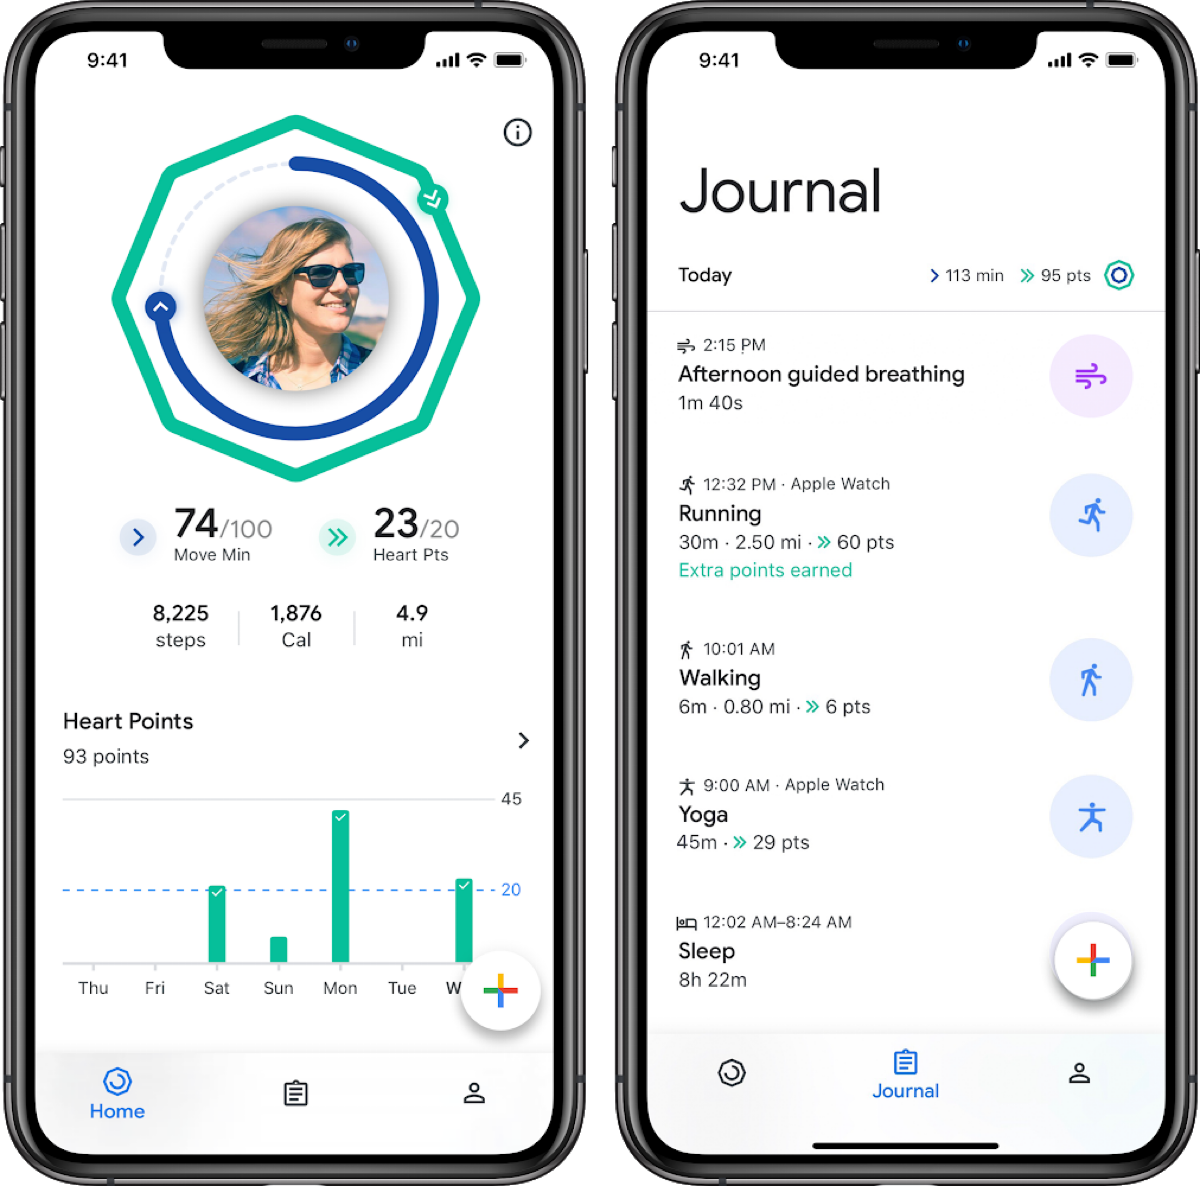 Screenshots of google fit iOS app